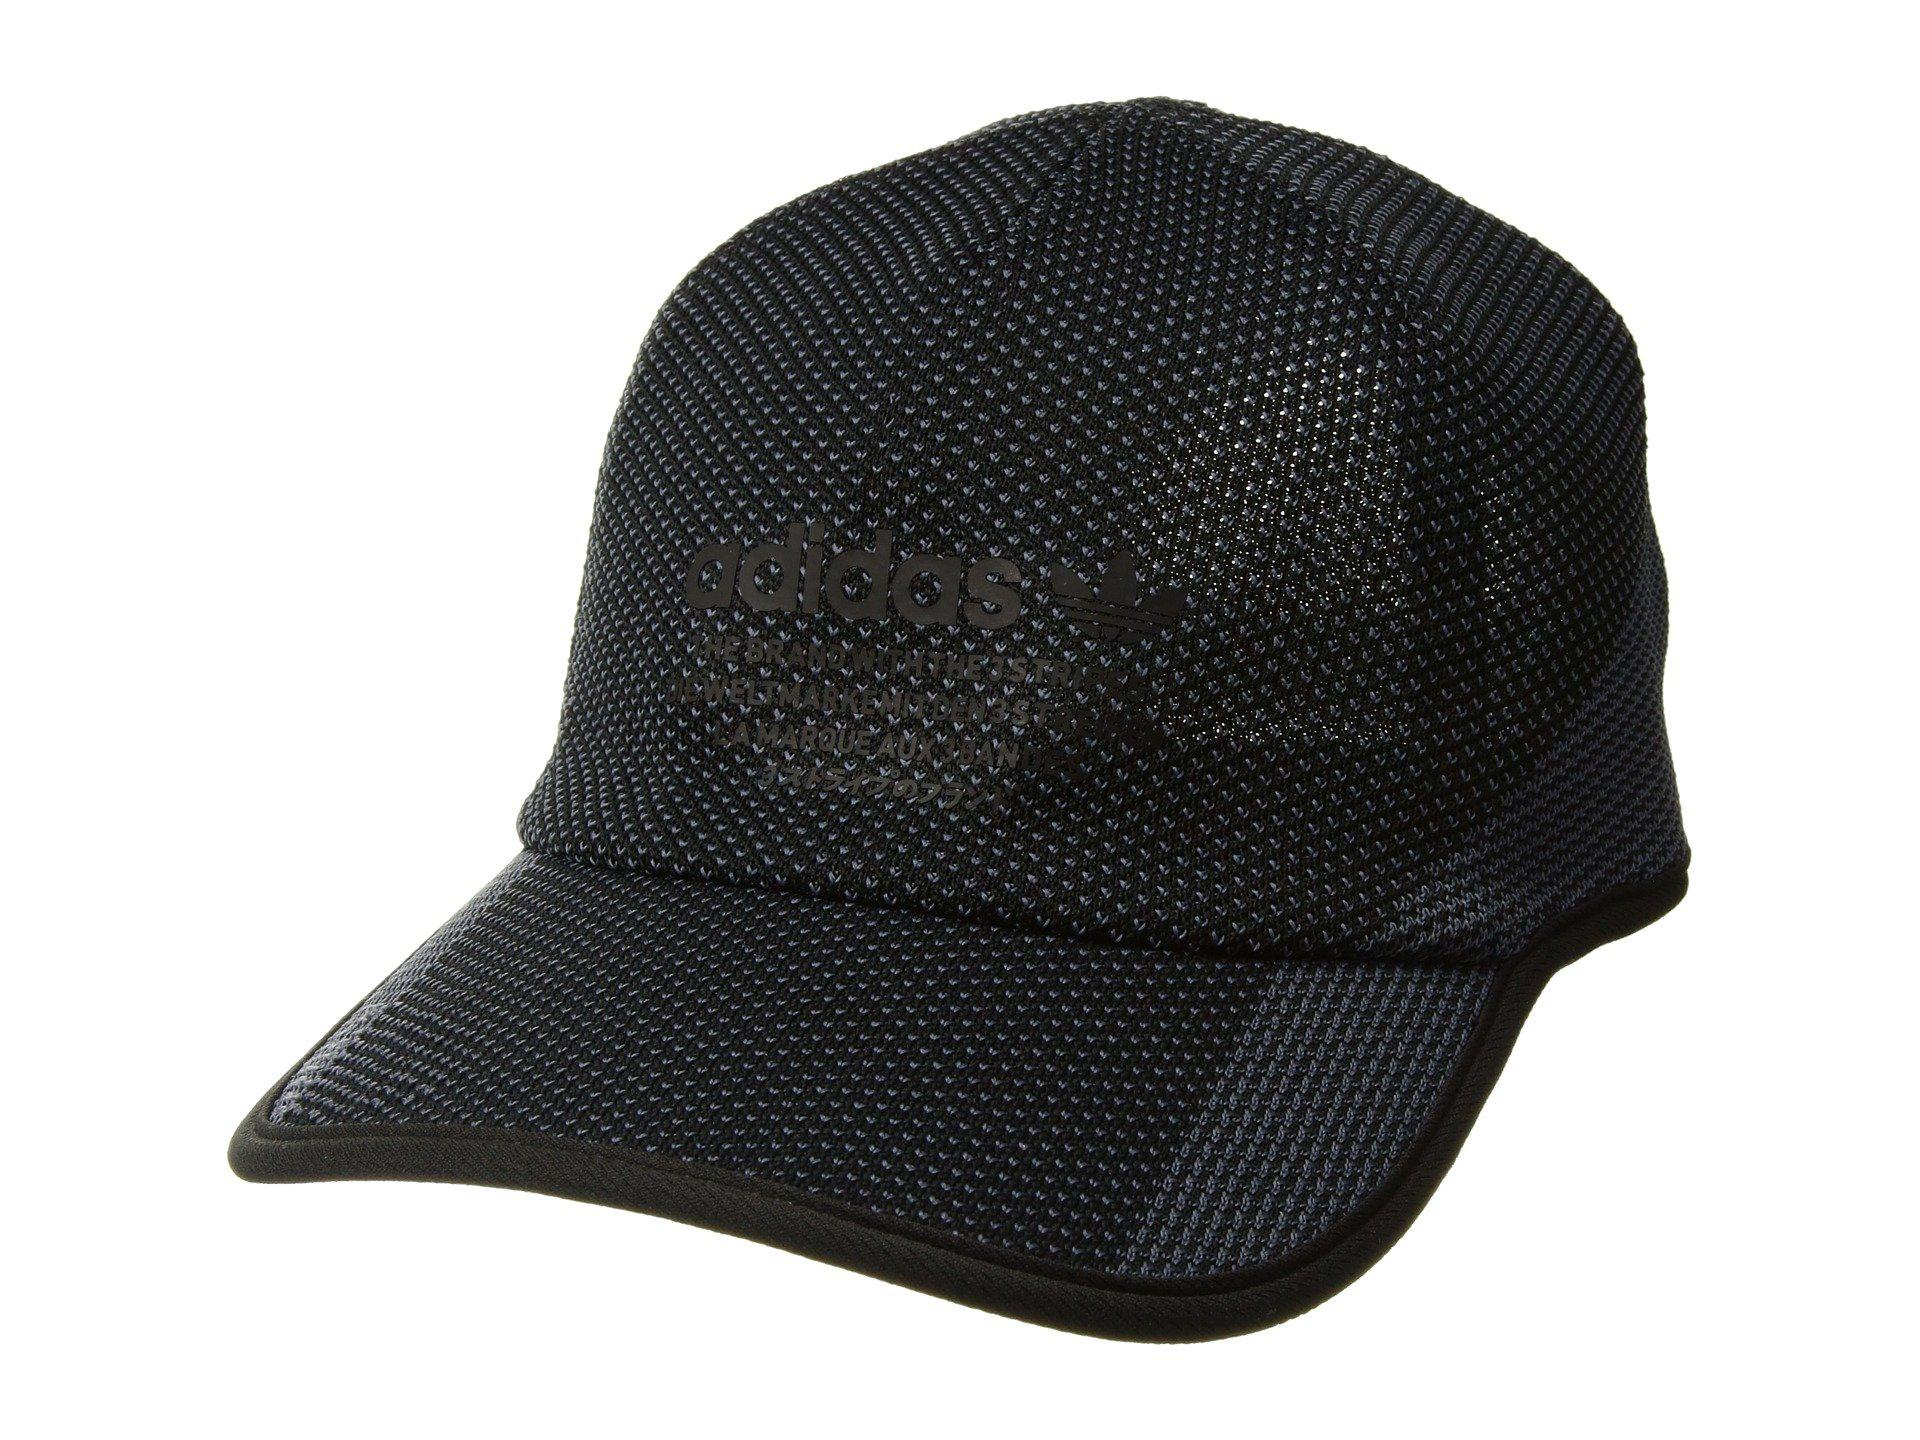 Lyst - adidas Originals Originals Nmd Prime Ii (black onix) Caps in ... 325ae56a72e8